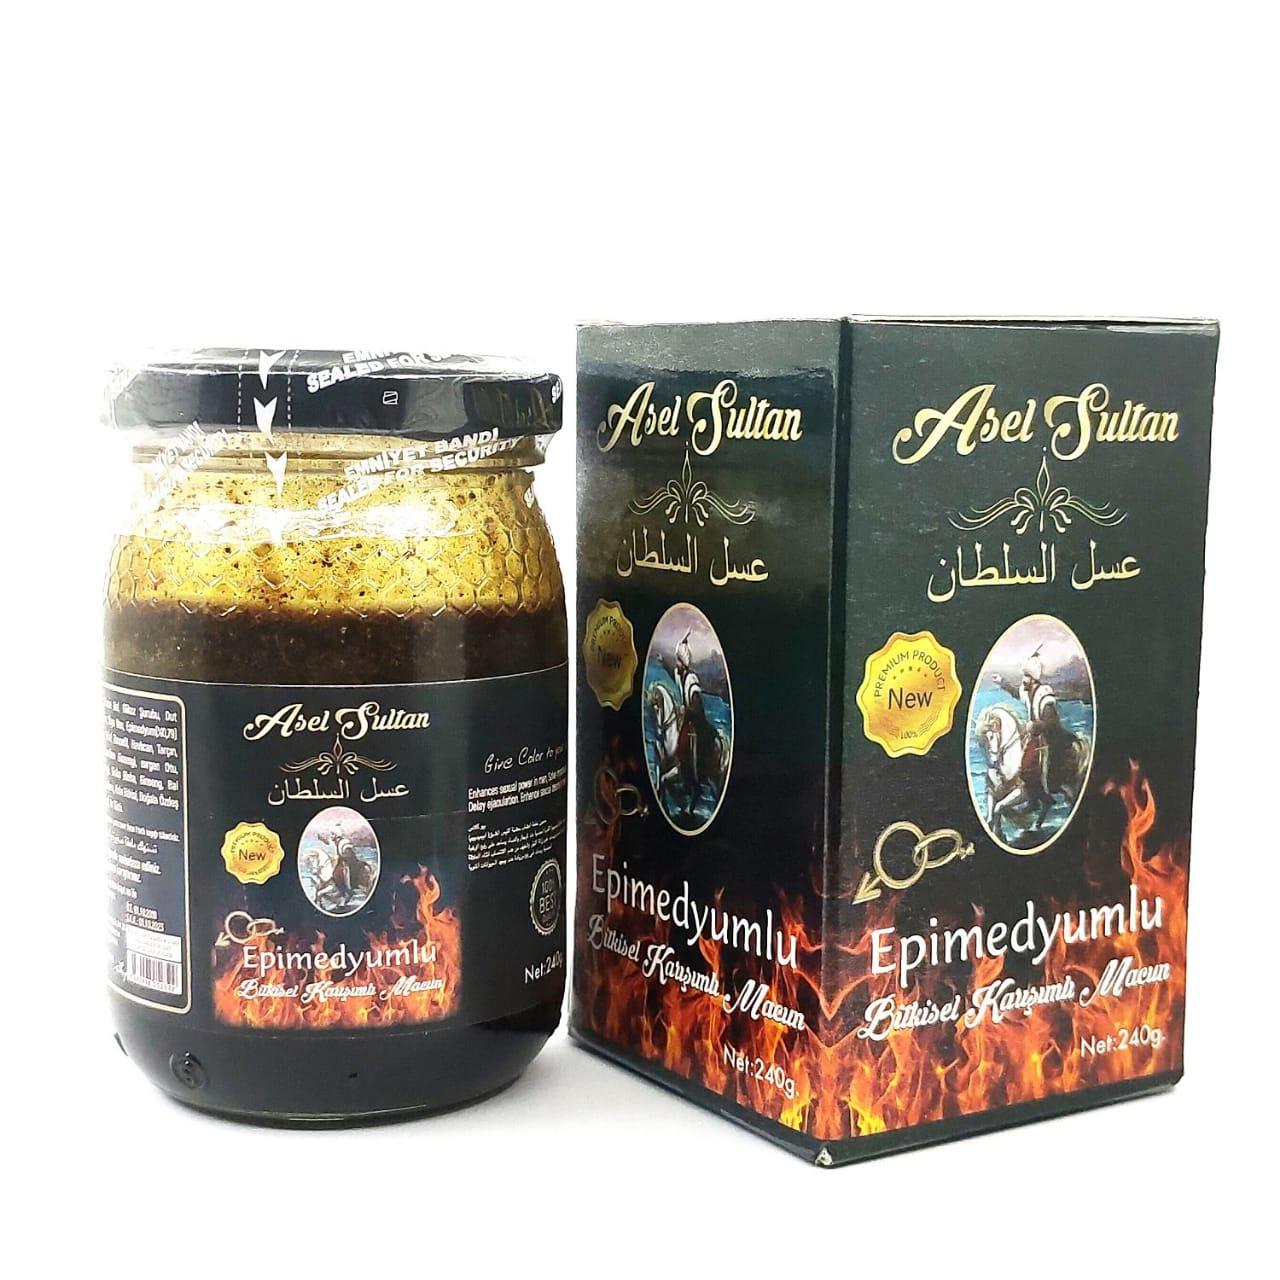 miel sultan aphrodisiaque force sexuel 240 g العسل سلطان مثير للشهوة الجنسية